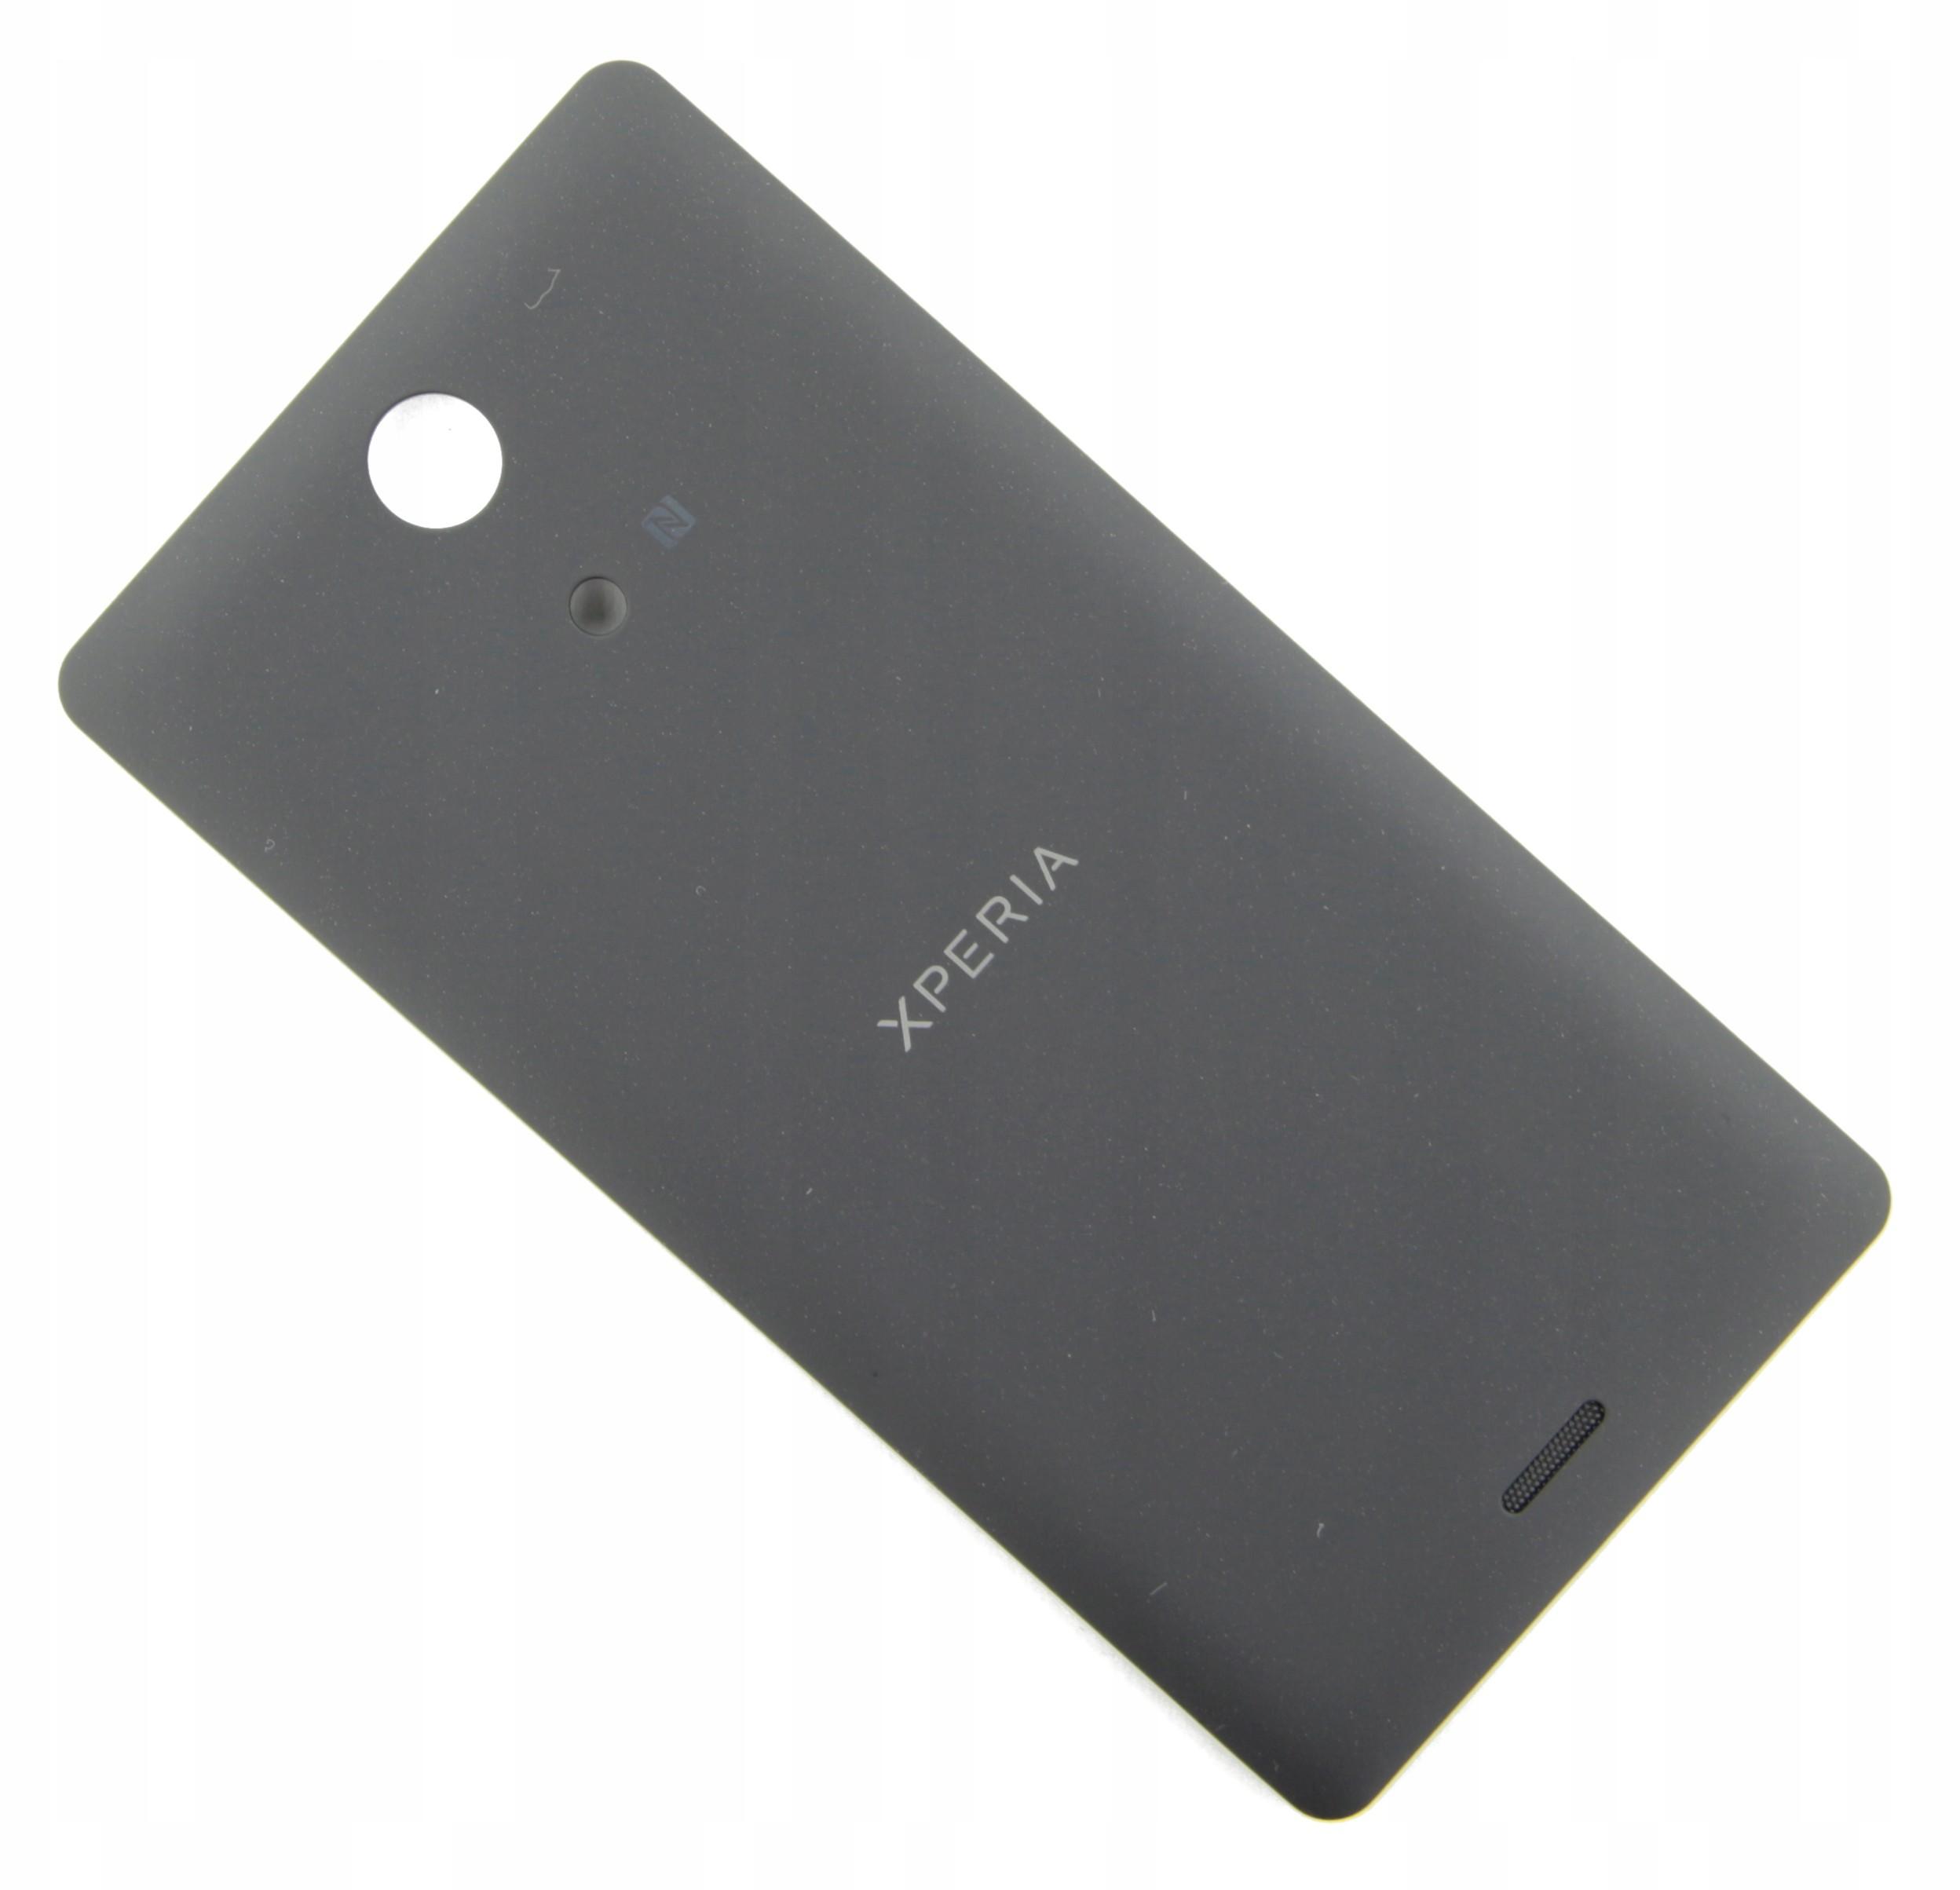 Obudowa Klapka Baterii Xperia Zr C5502 C5503 Black